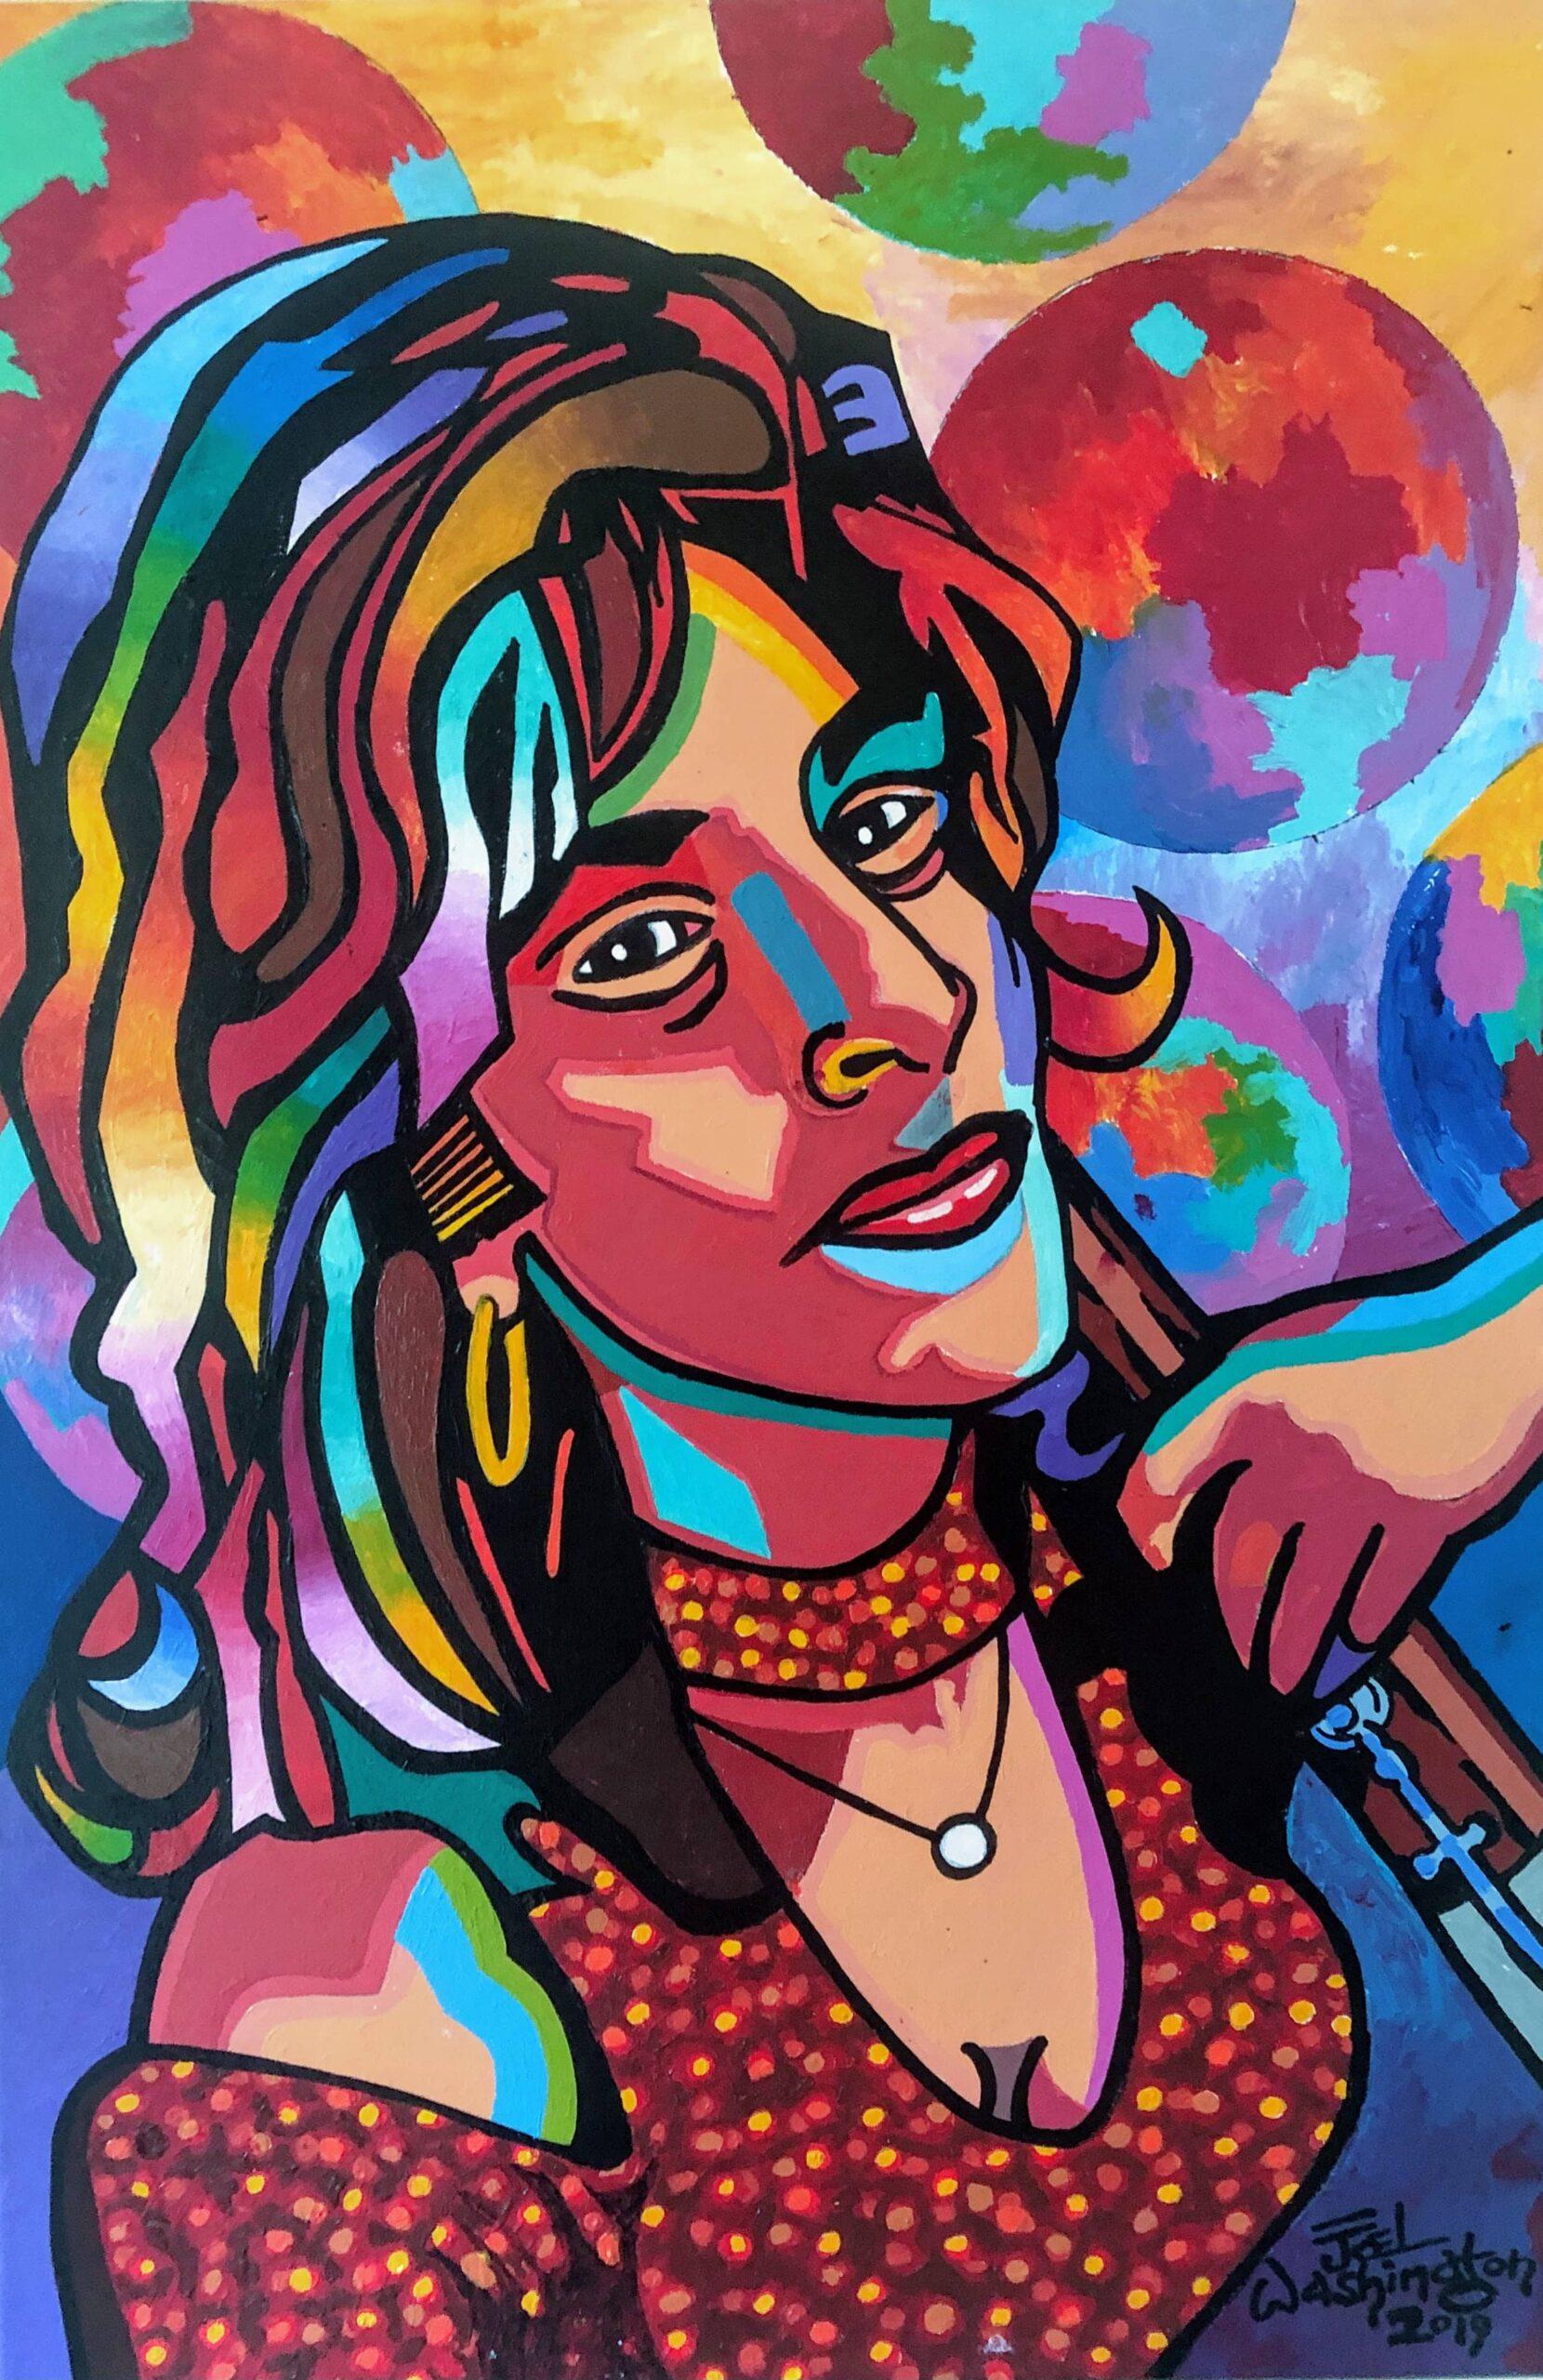 Portrait Art of Kathleen McLean by Artist Joel Washington